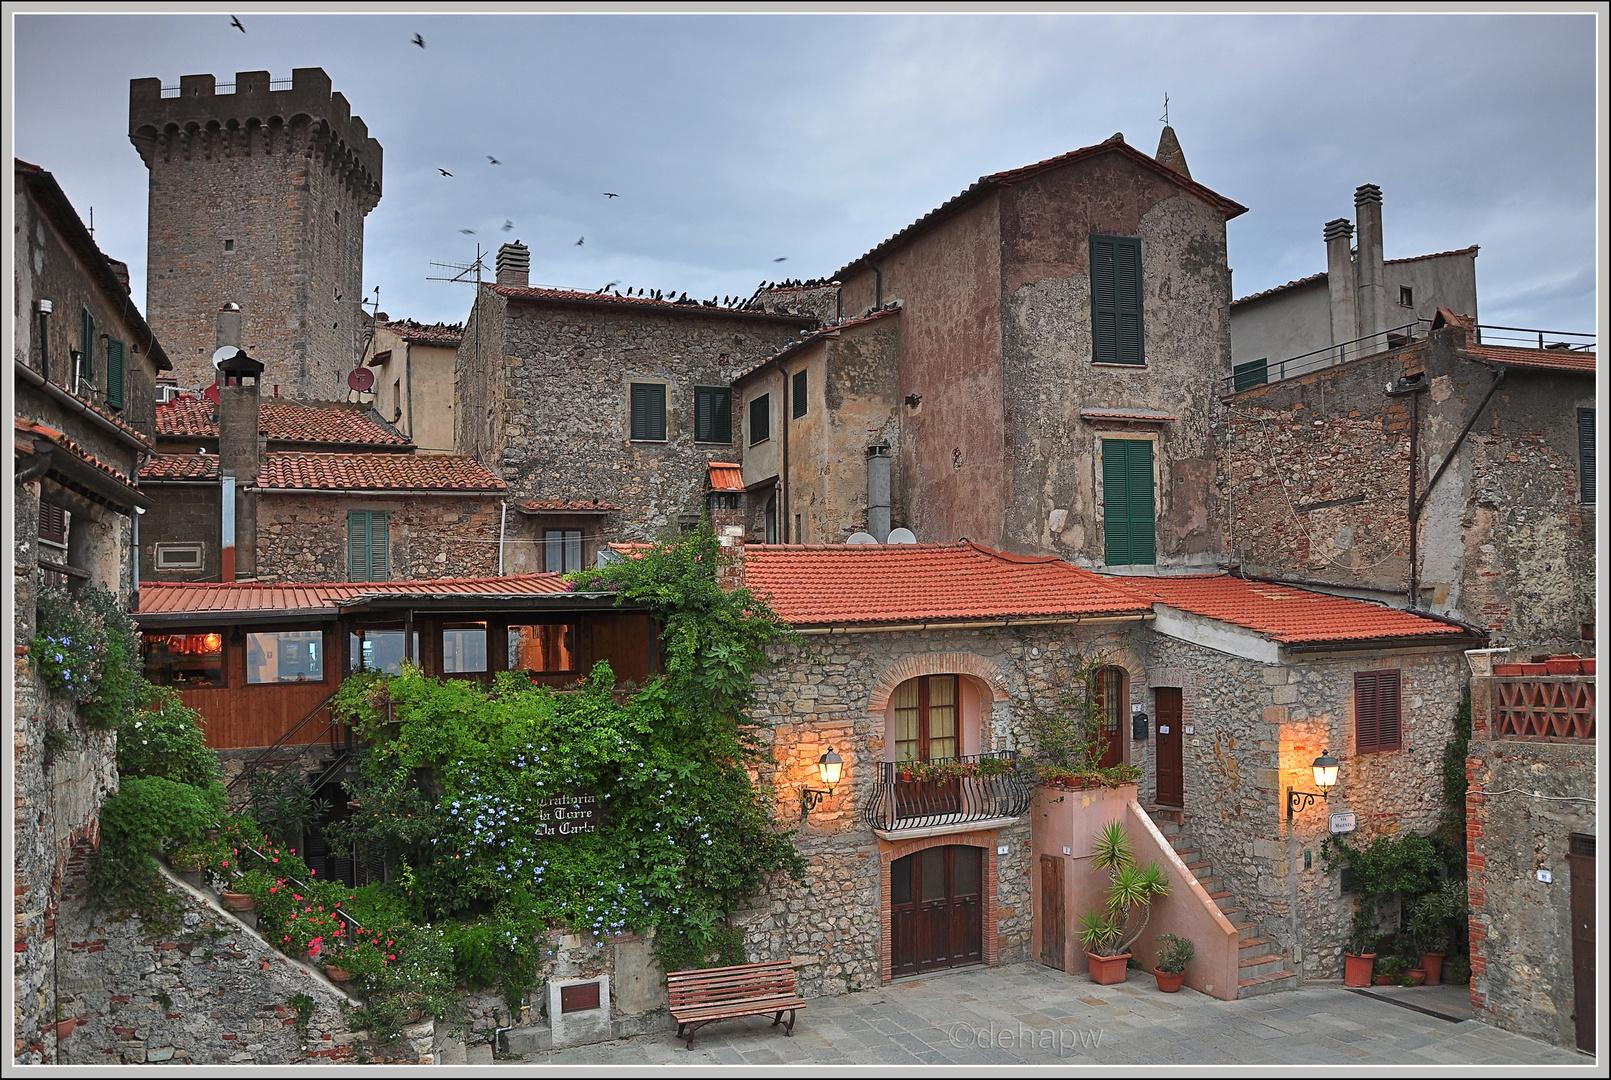 Capalbio / Toskana 2